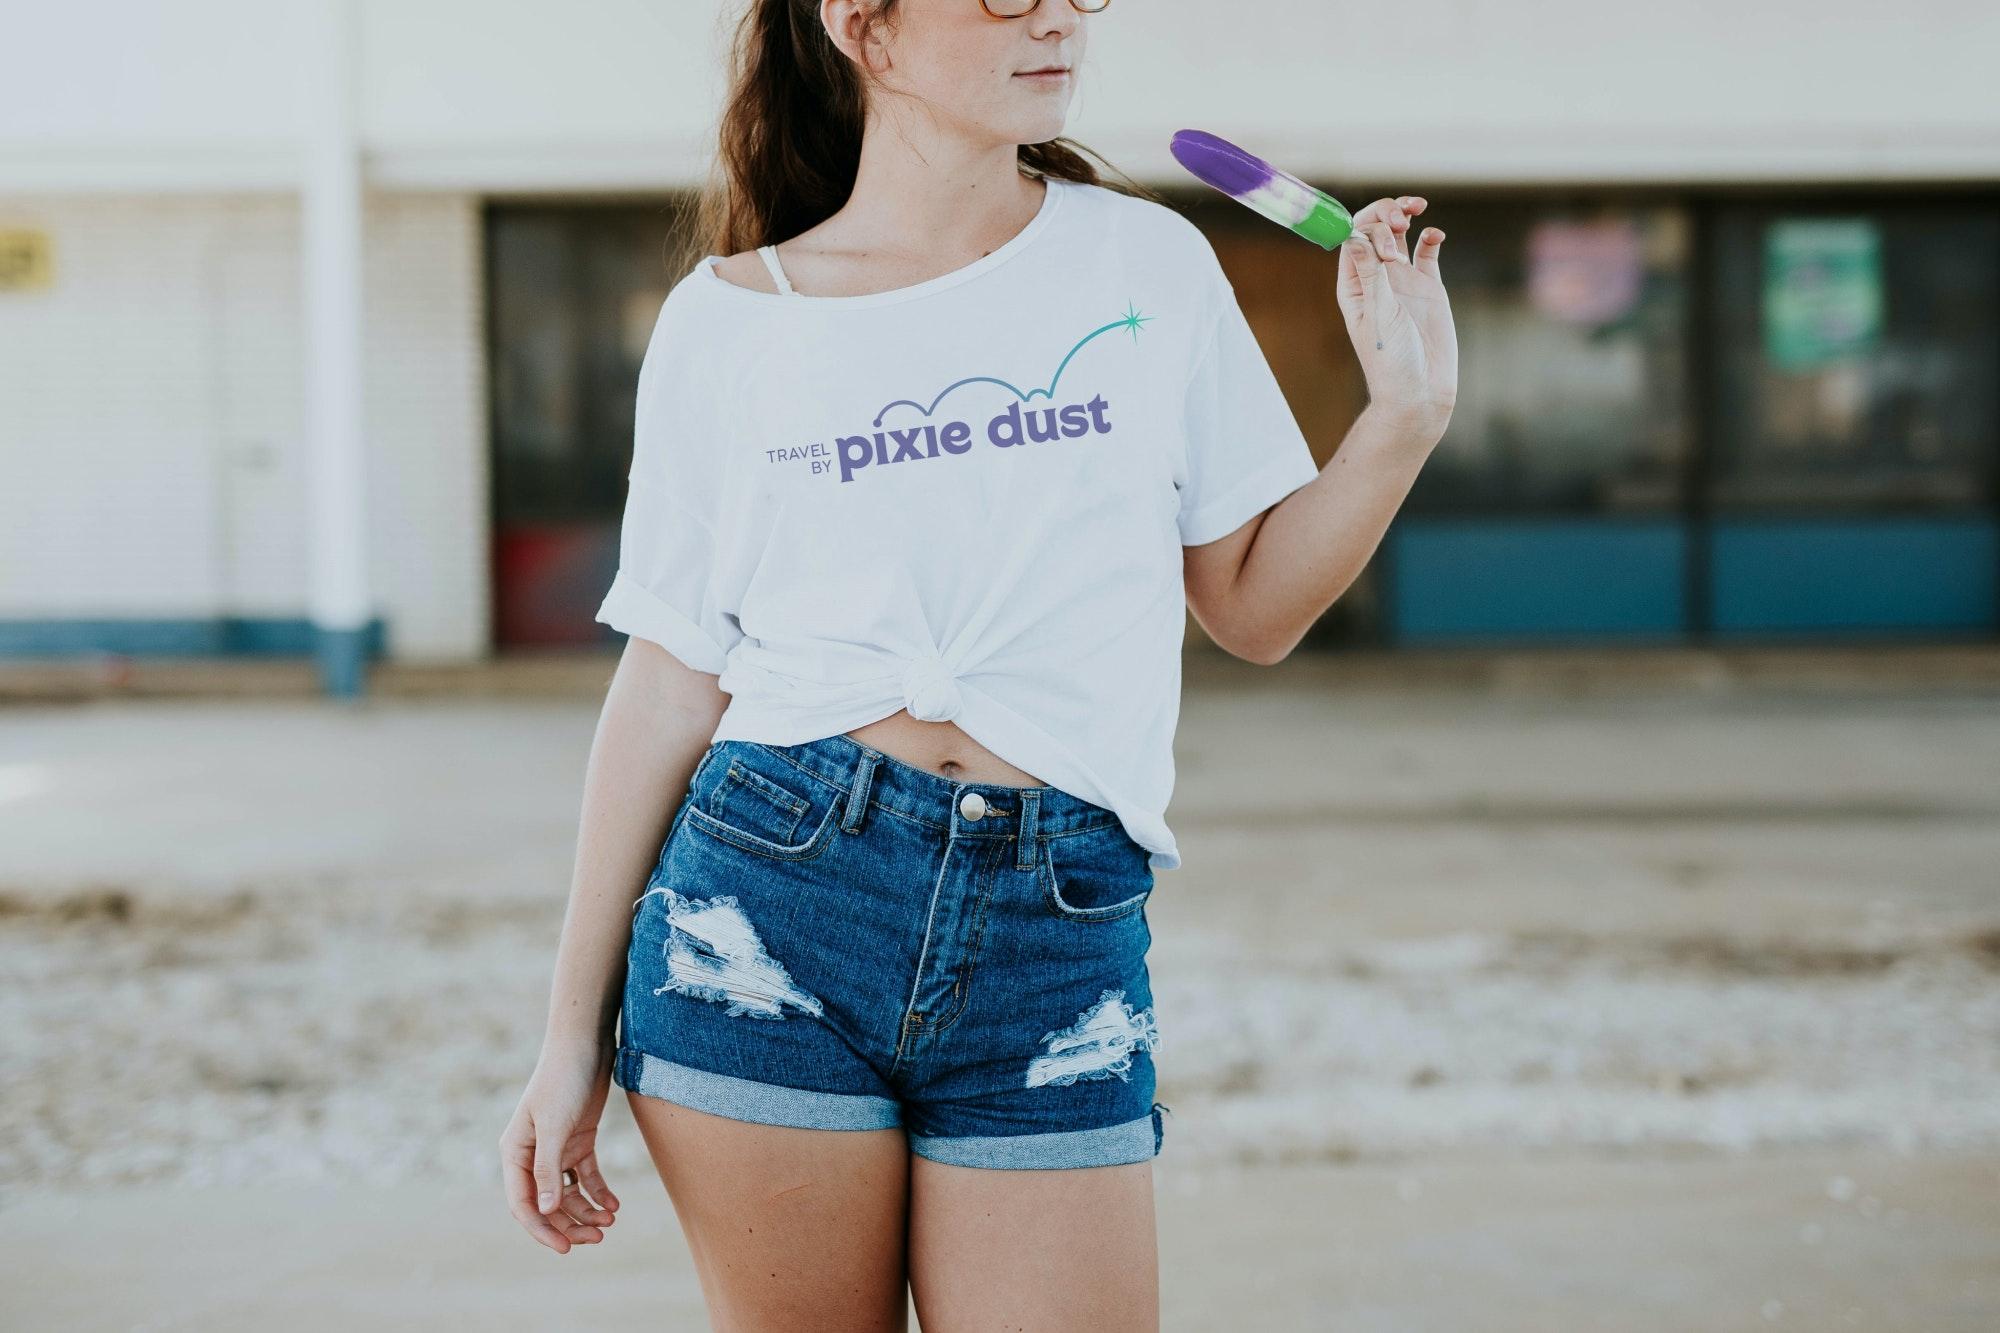 TBPD tshirt design